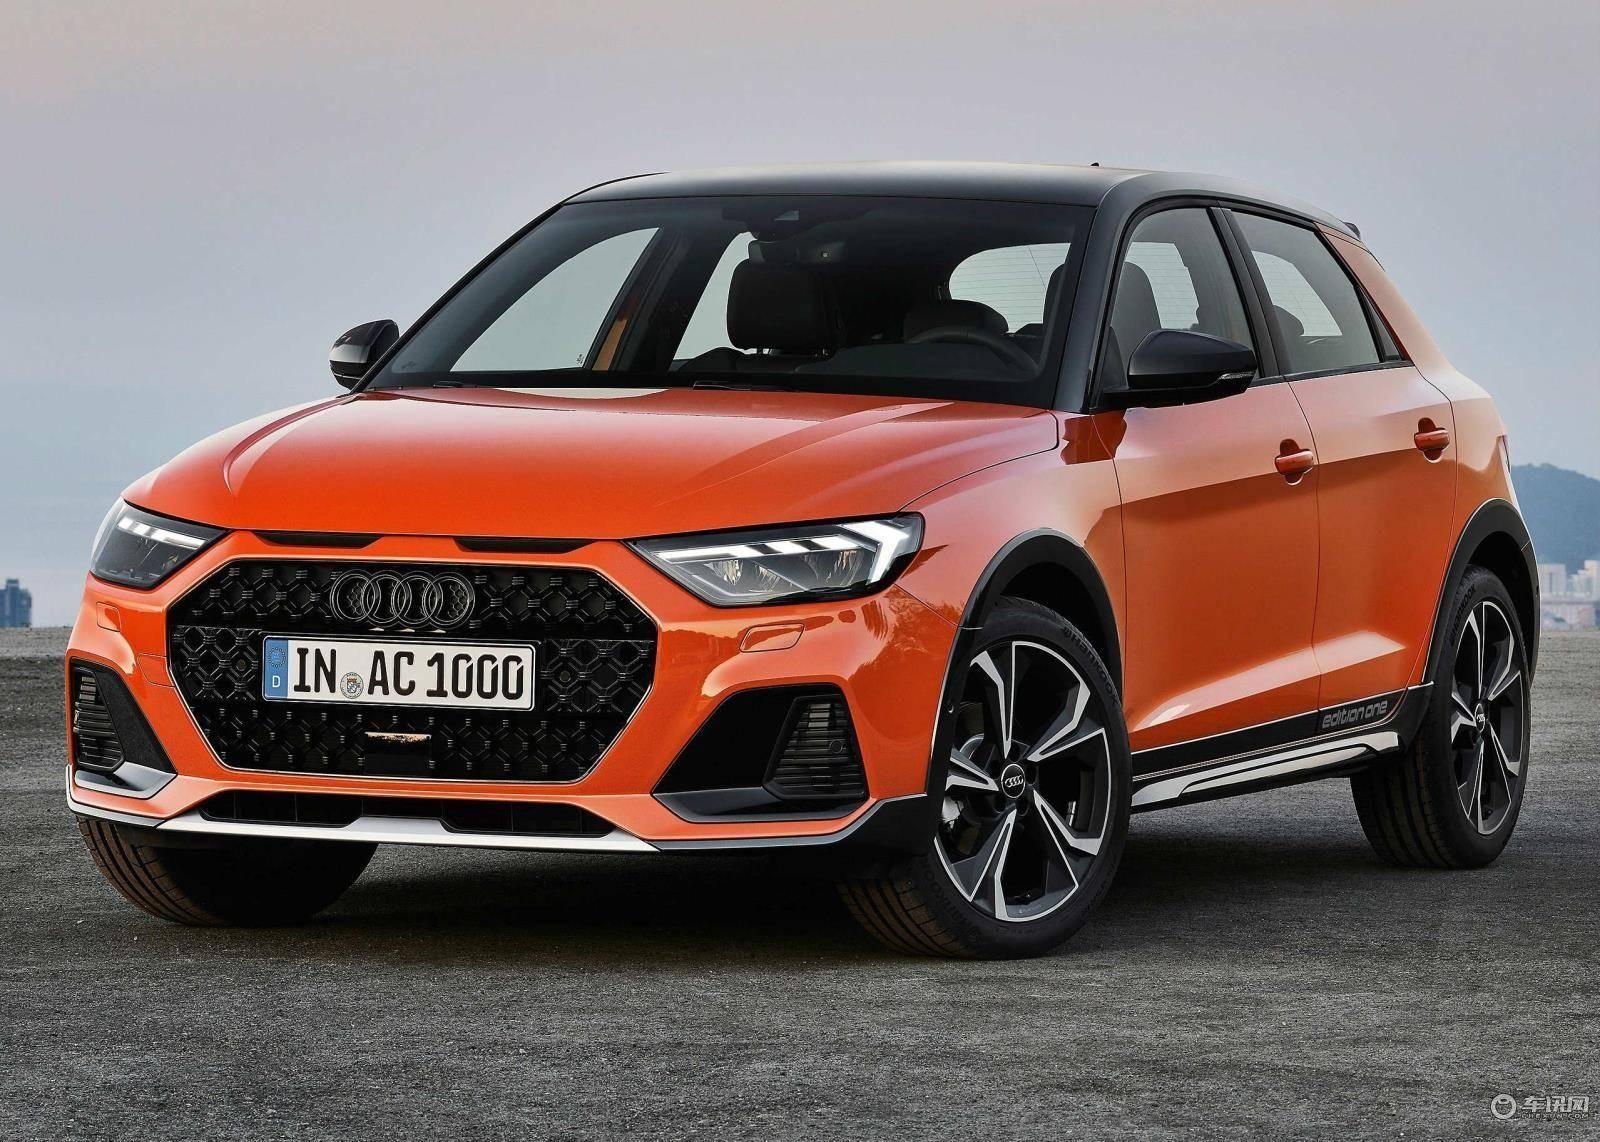 Audi-A1_Citycarver-2020-wallpaper_meitu_1.jpg